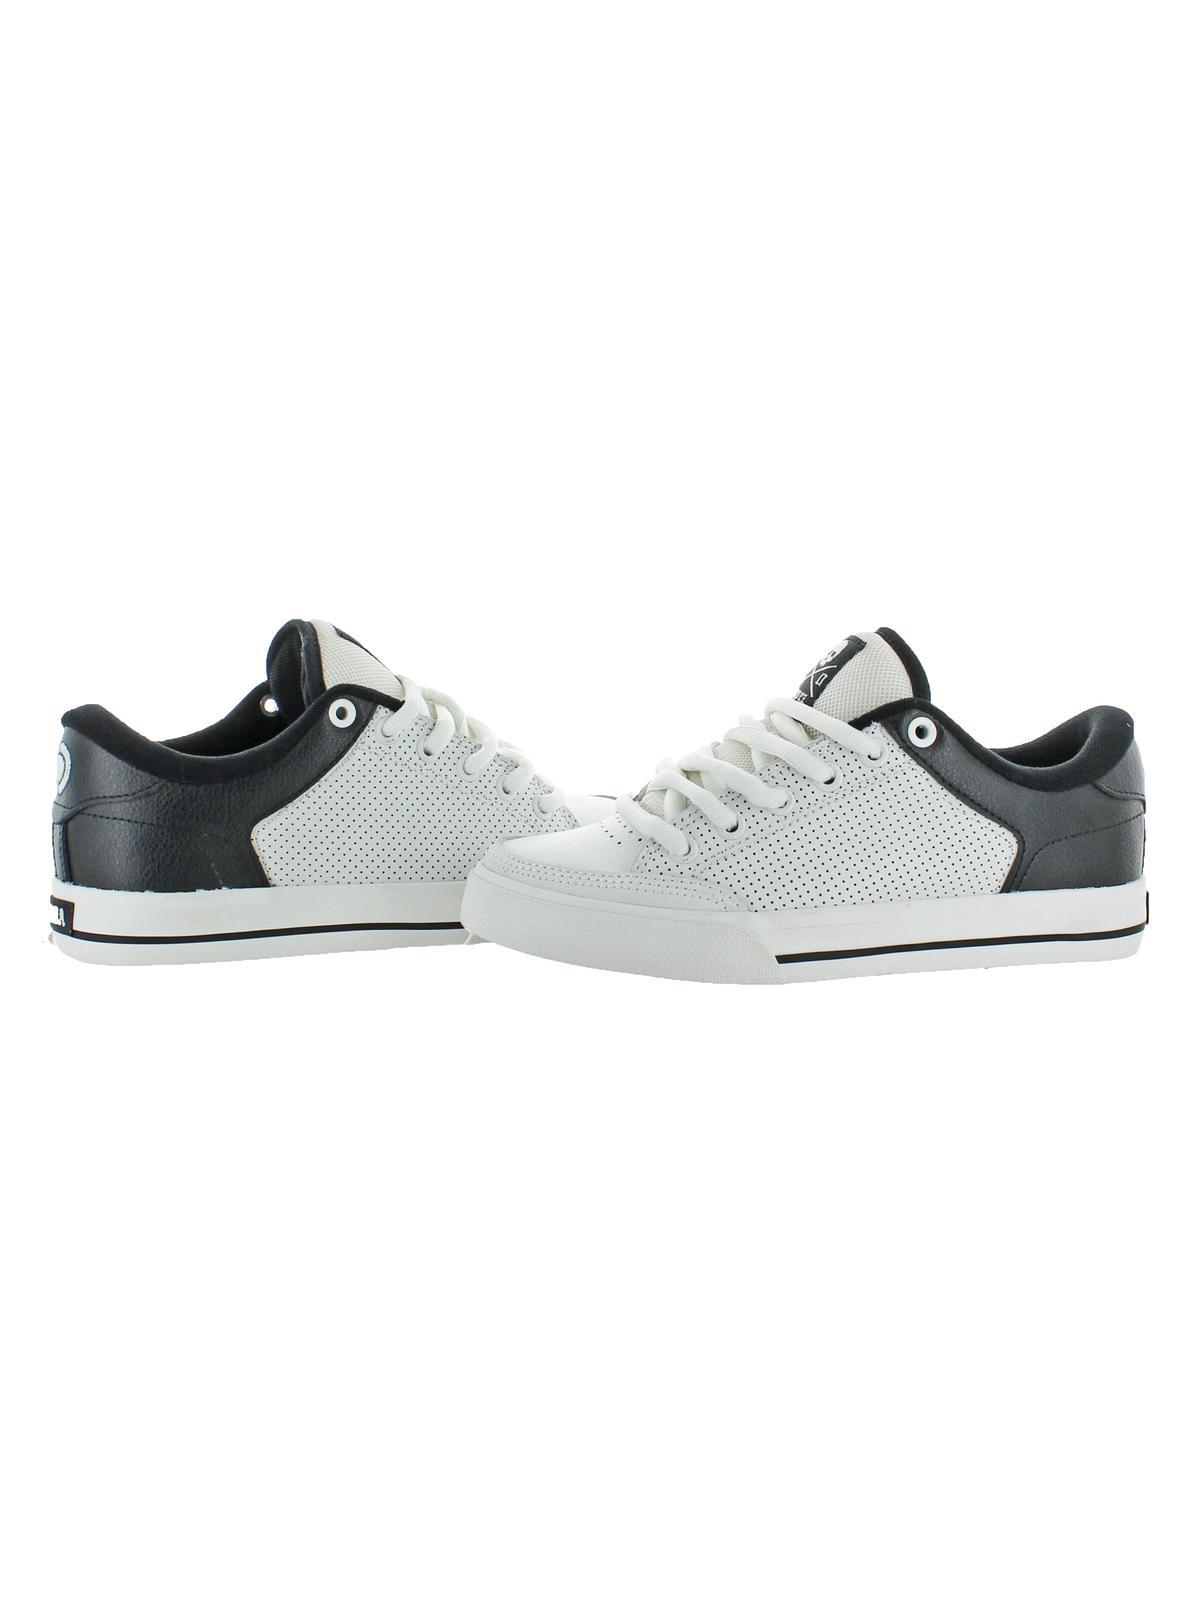 C1RCA Mens Lopez 50 SE Classic Vulc Skate Shoes White 6 Medium (D)